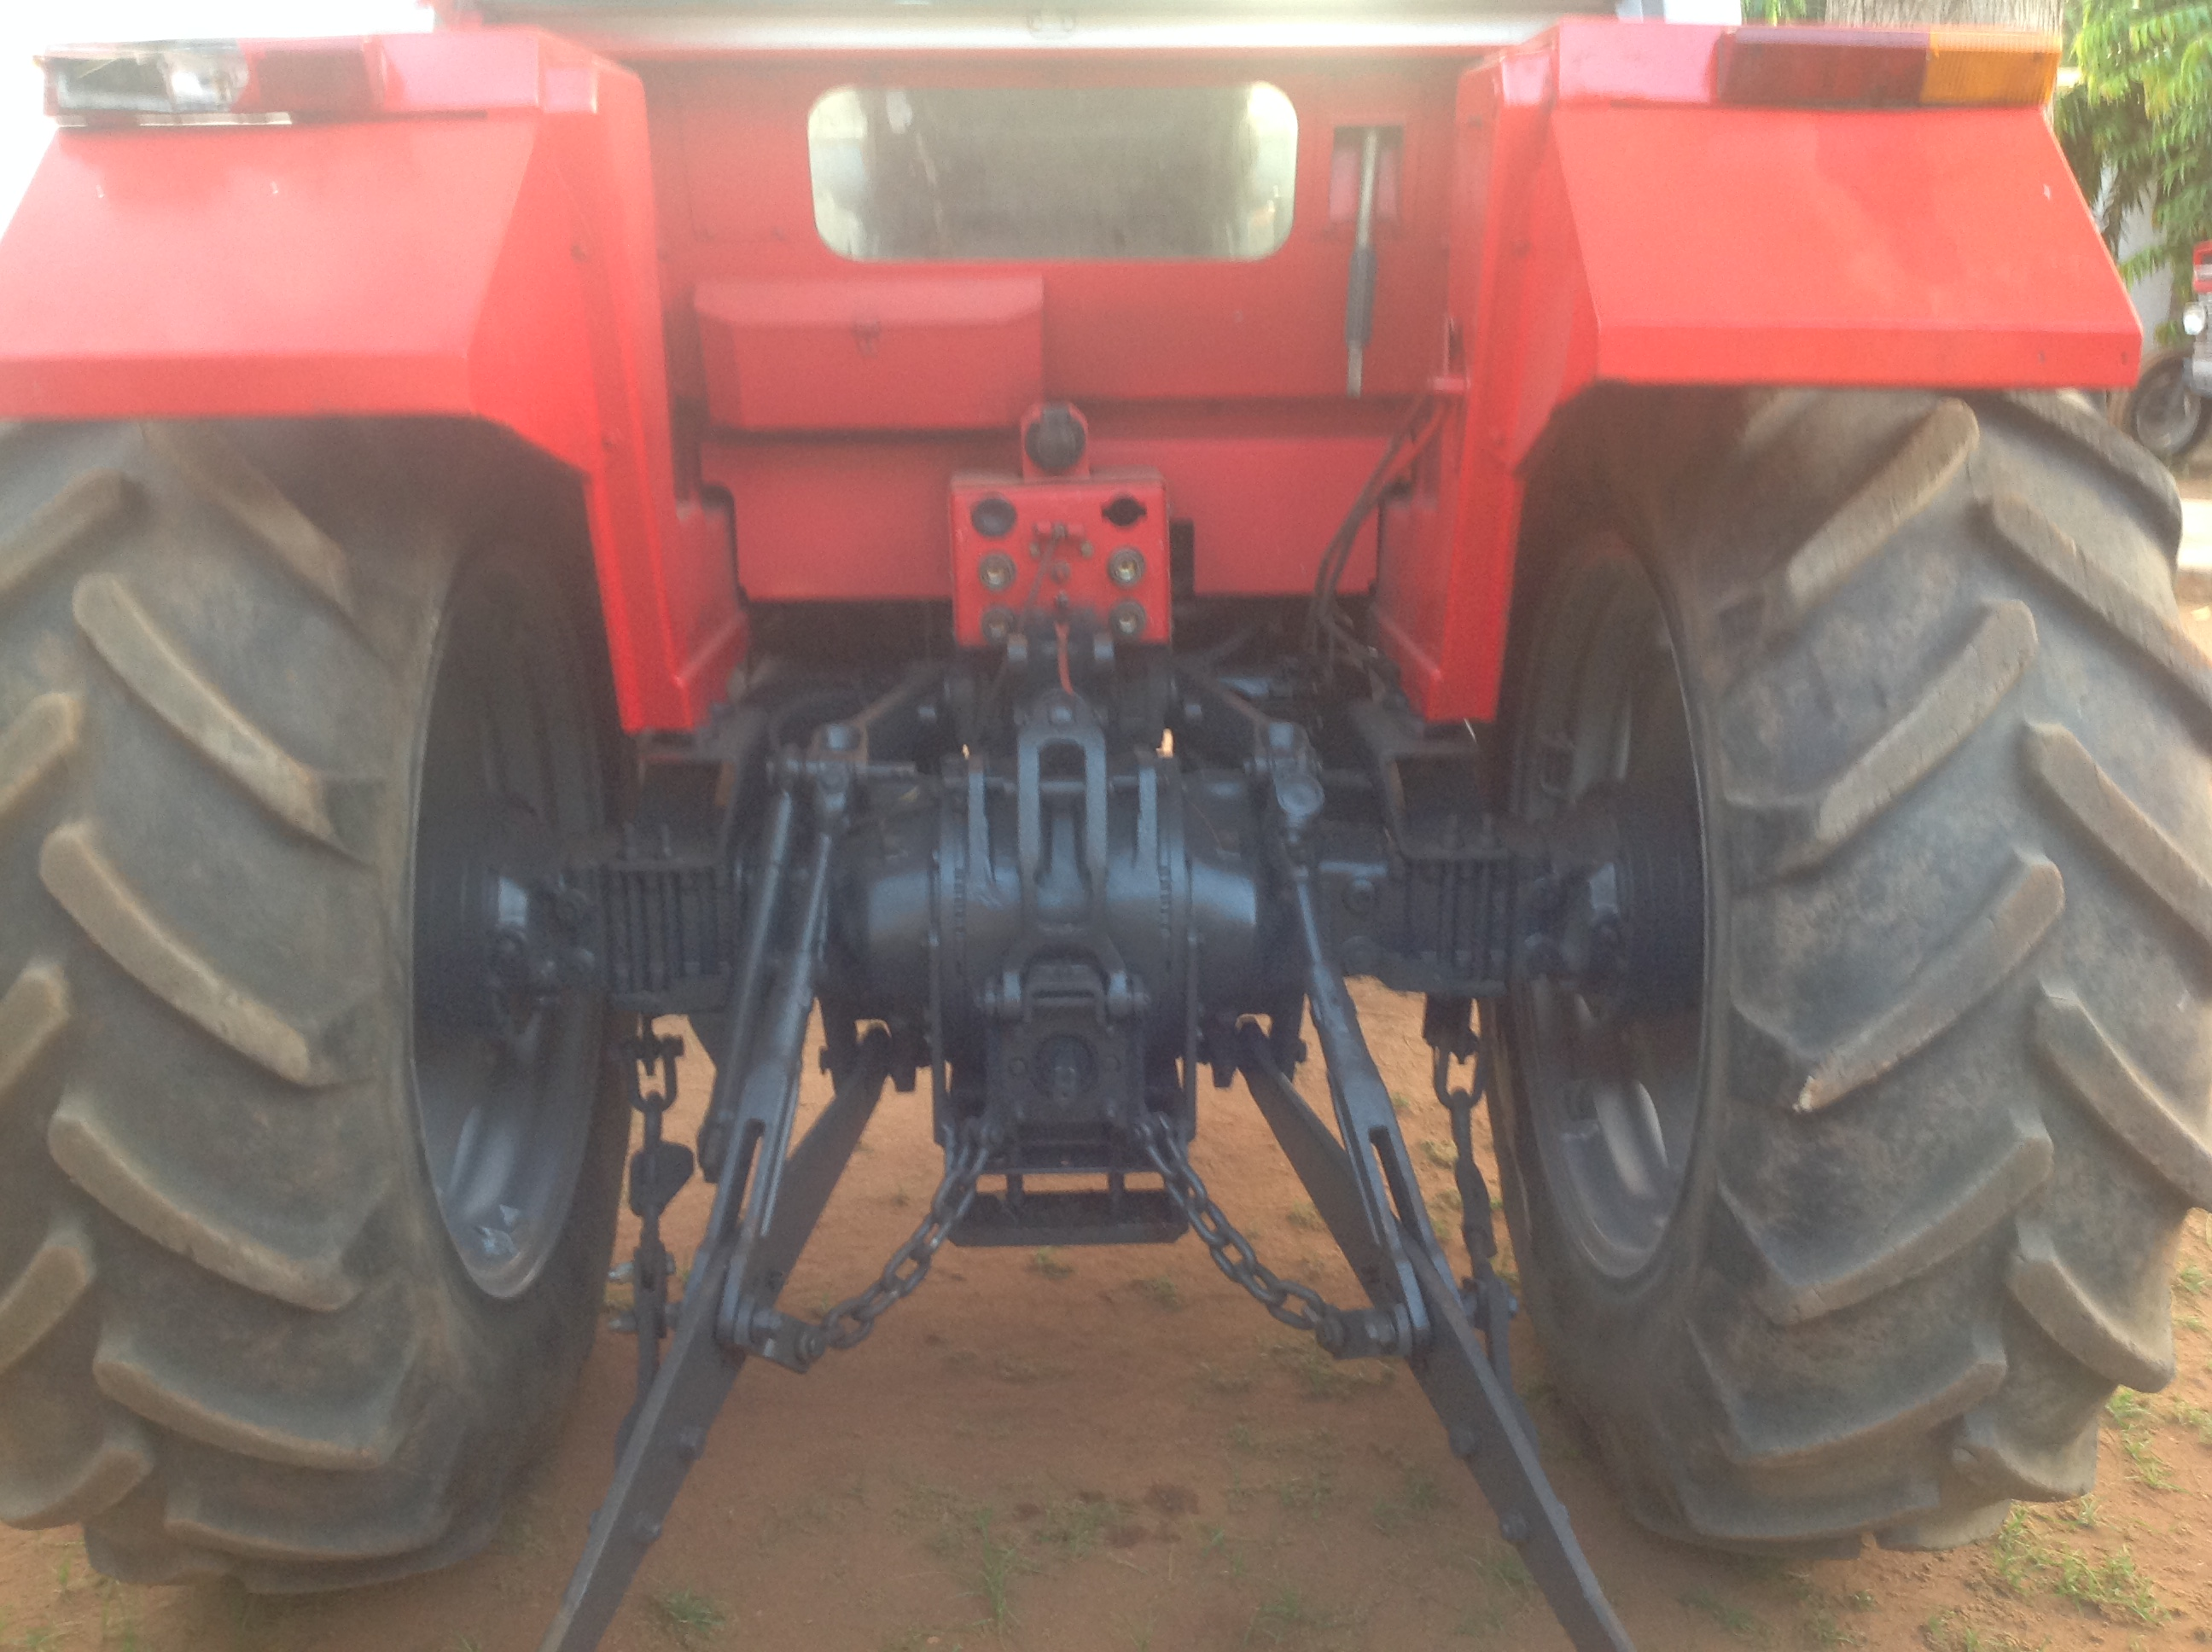 used massey ferguson 590 used tractors tanzania rh danagrisol com massey ferguson 590 manual massey ferguson 590 workshop manual pdf